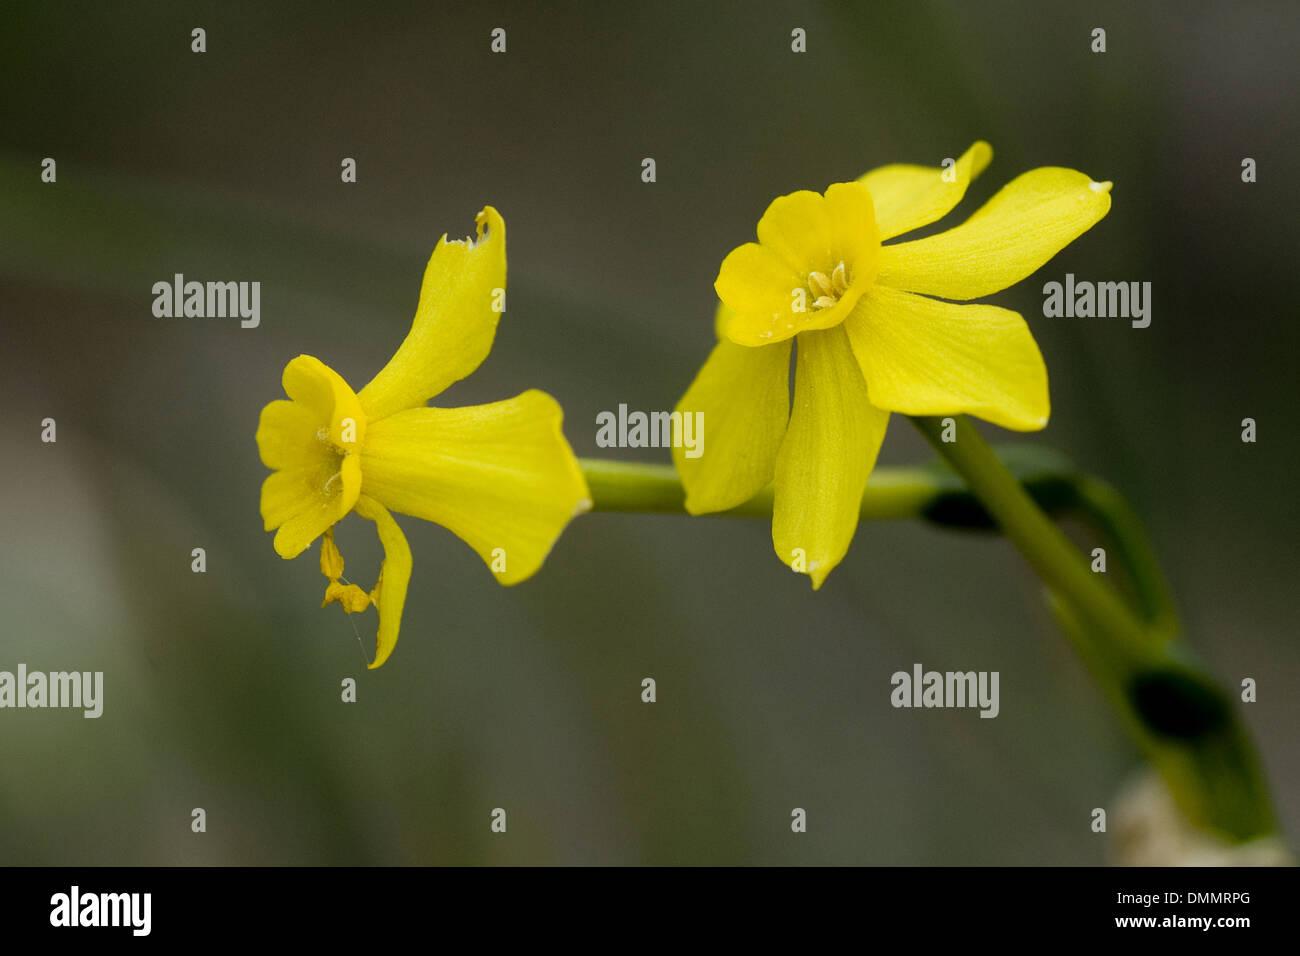 jonquil, narcissus jonquilla Stock Photo